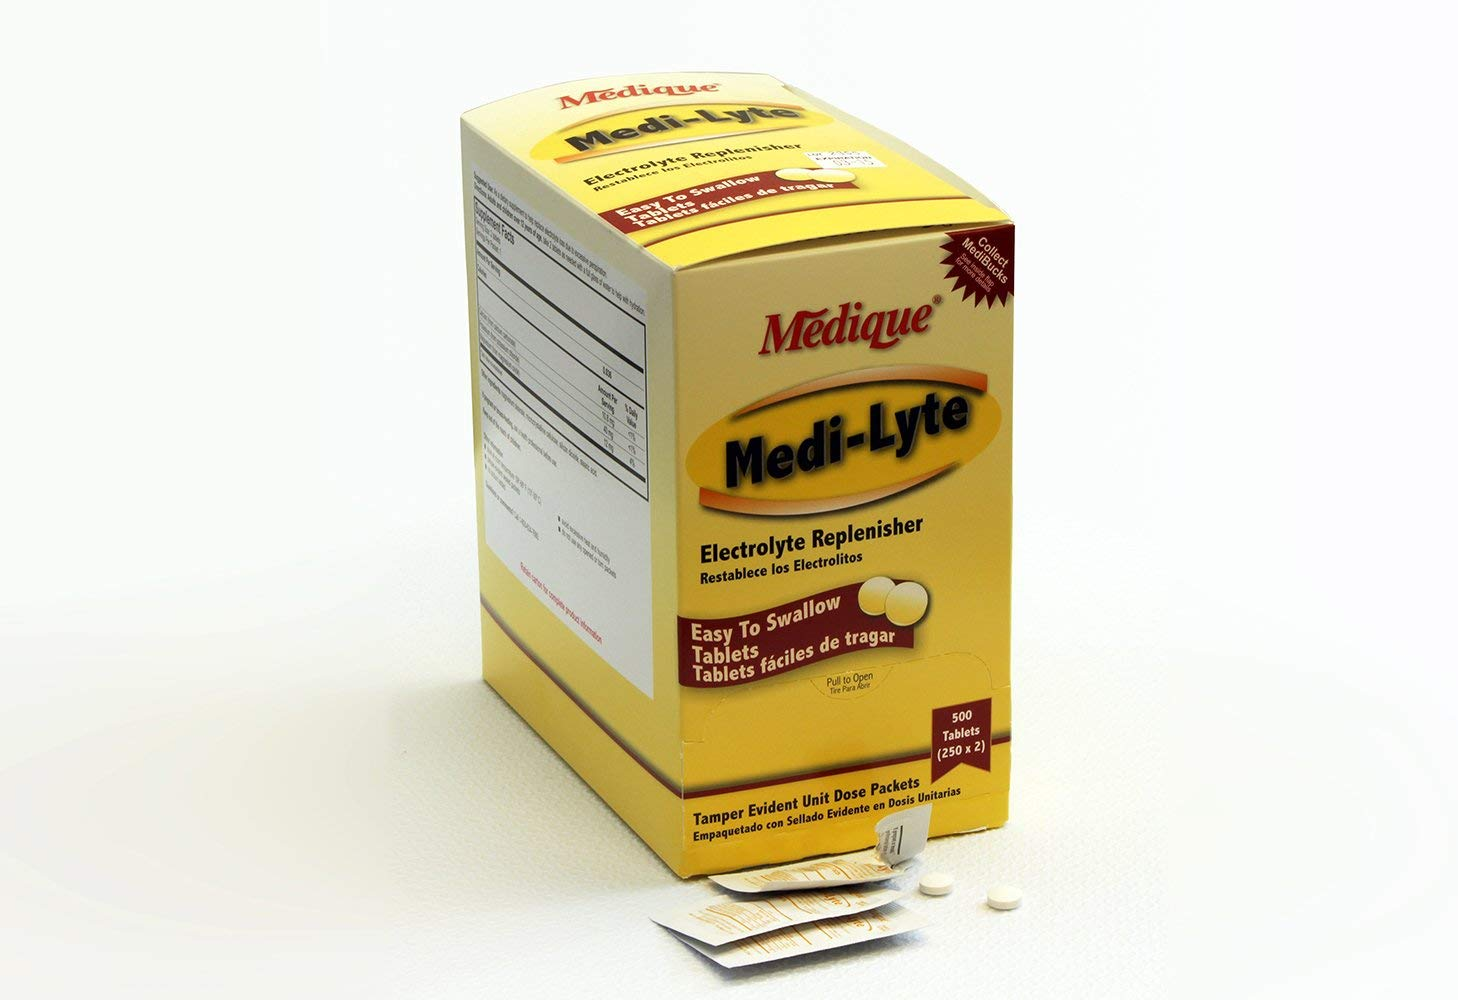 Medique Medi-Lyte